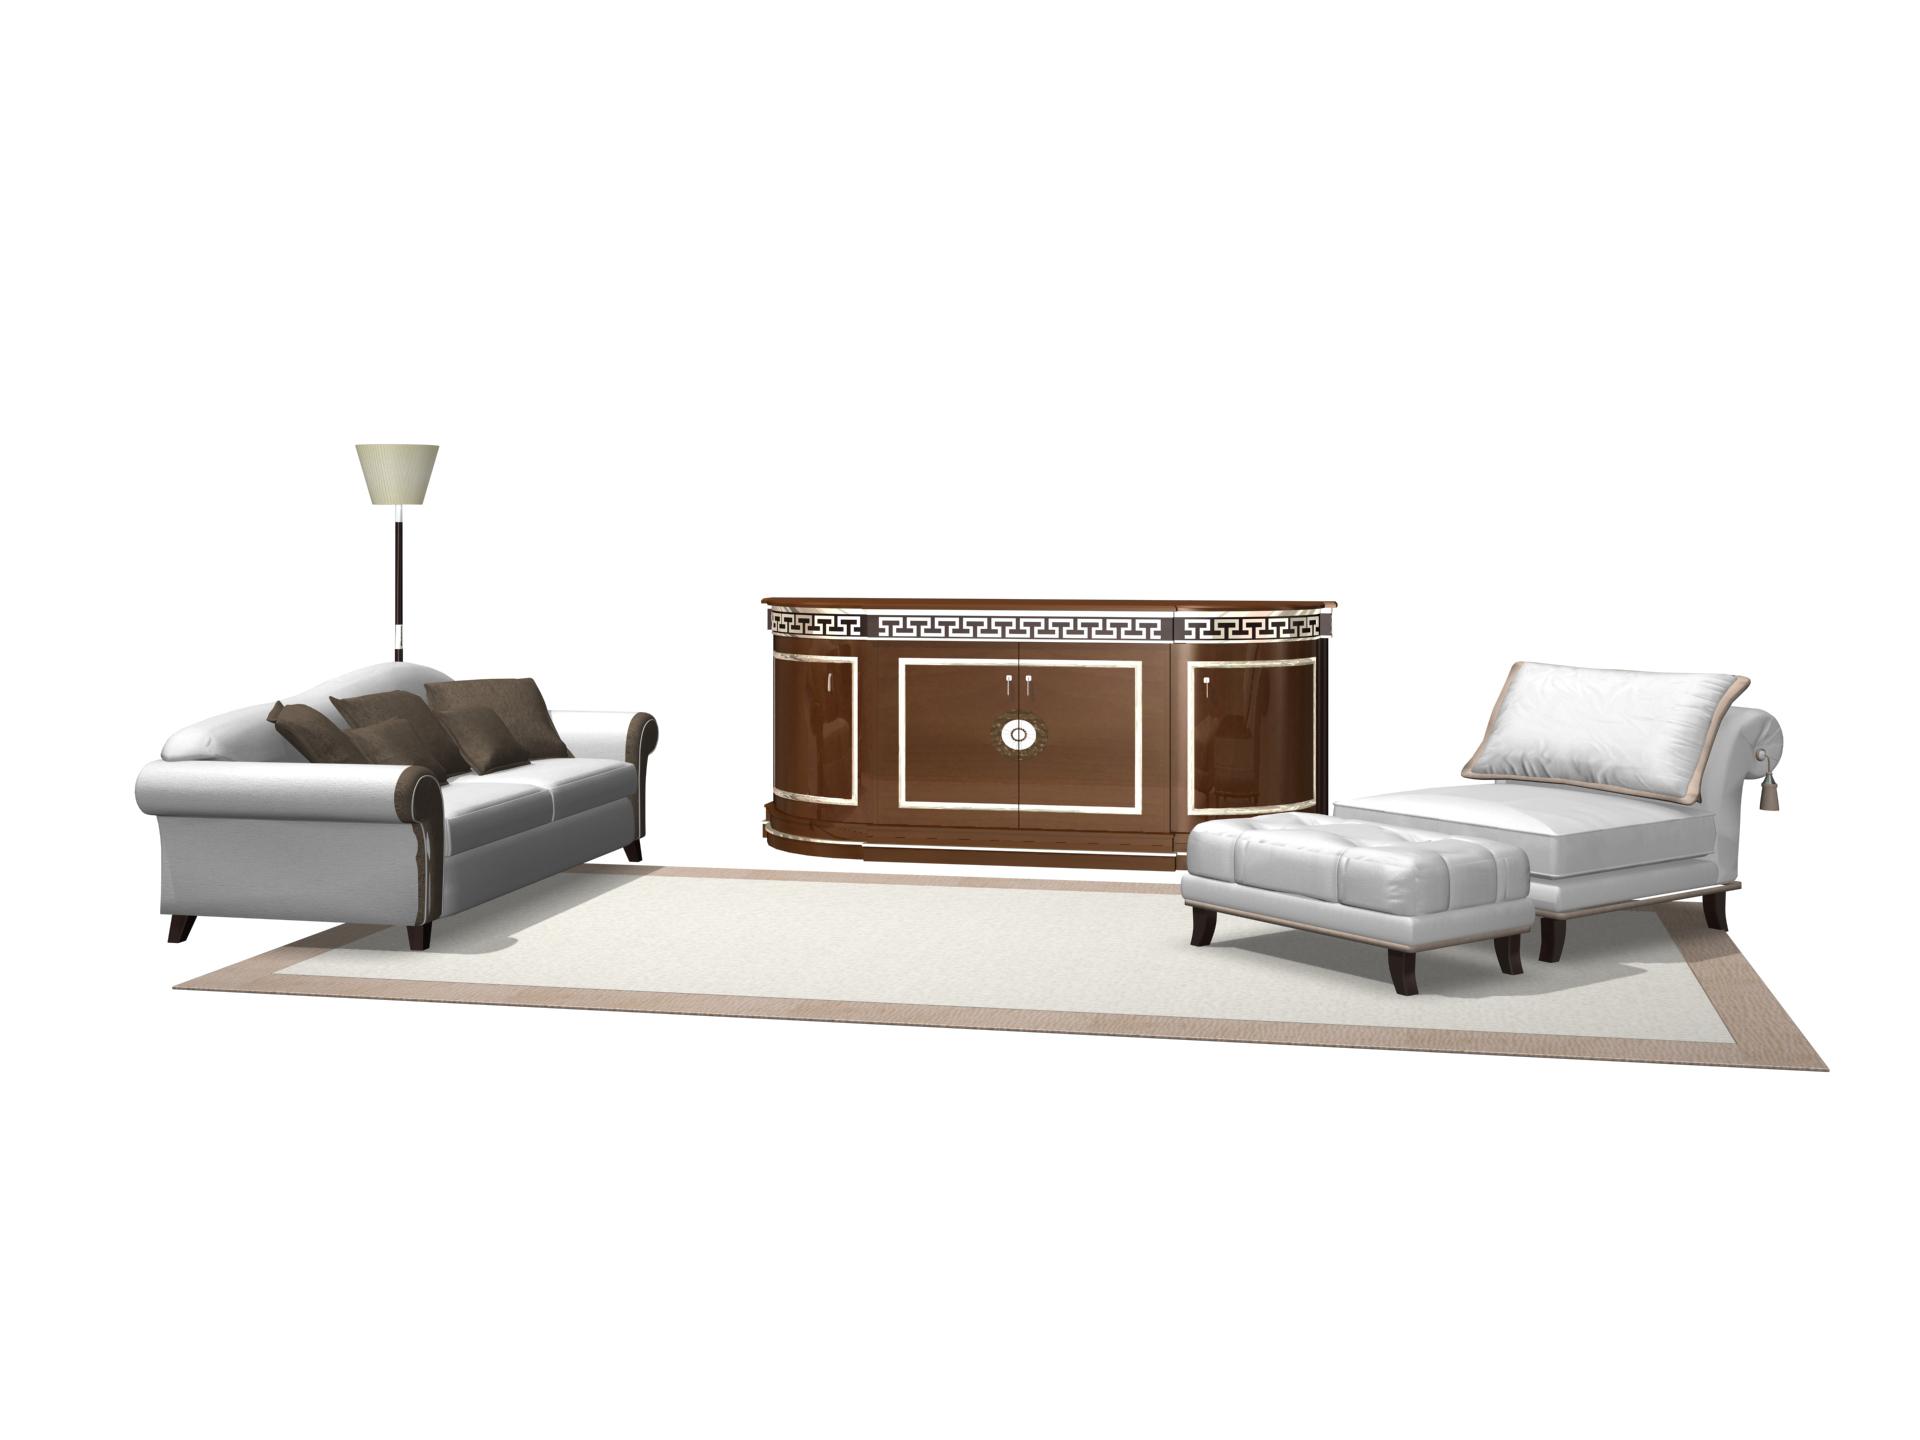 furniture – sas 003 3D Model